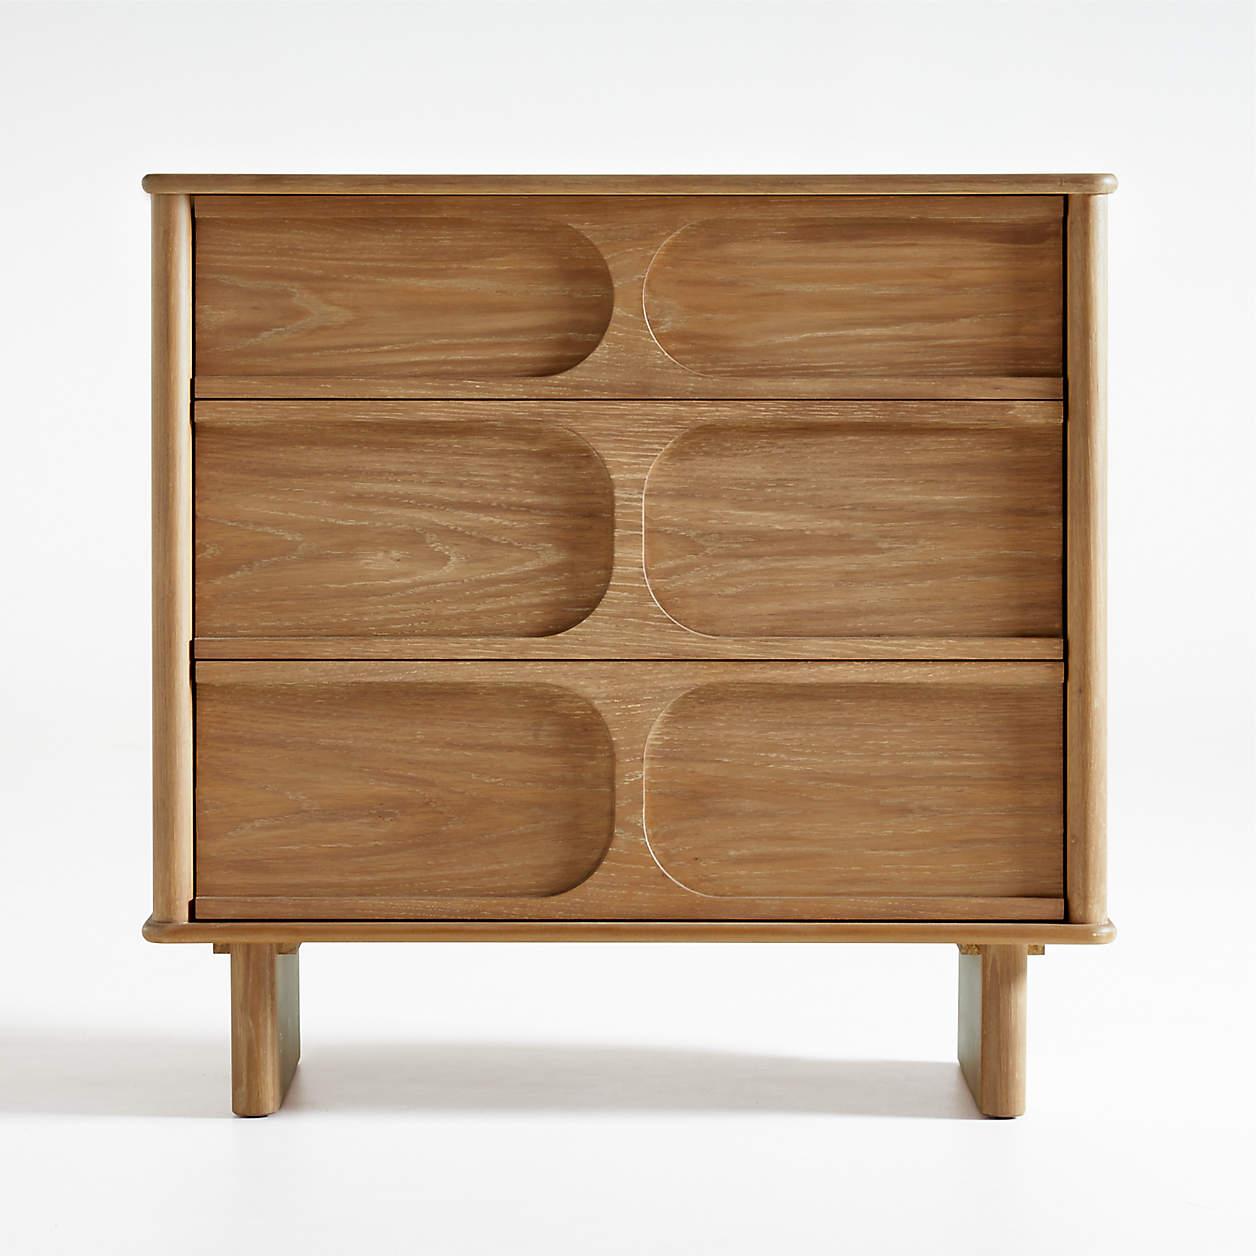 wes-3-drawer-wood-dresser